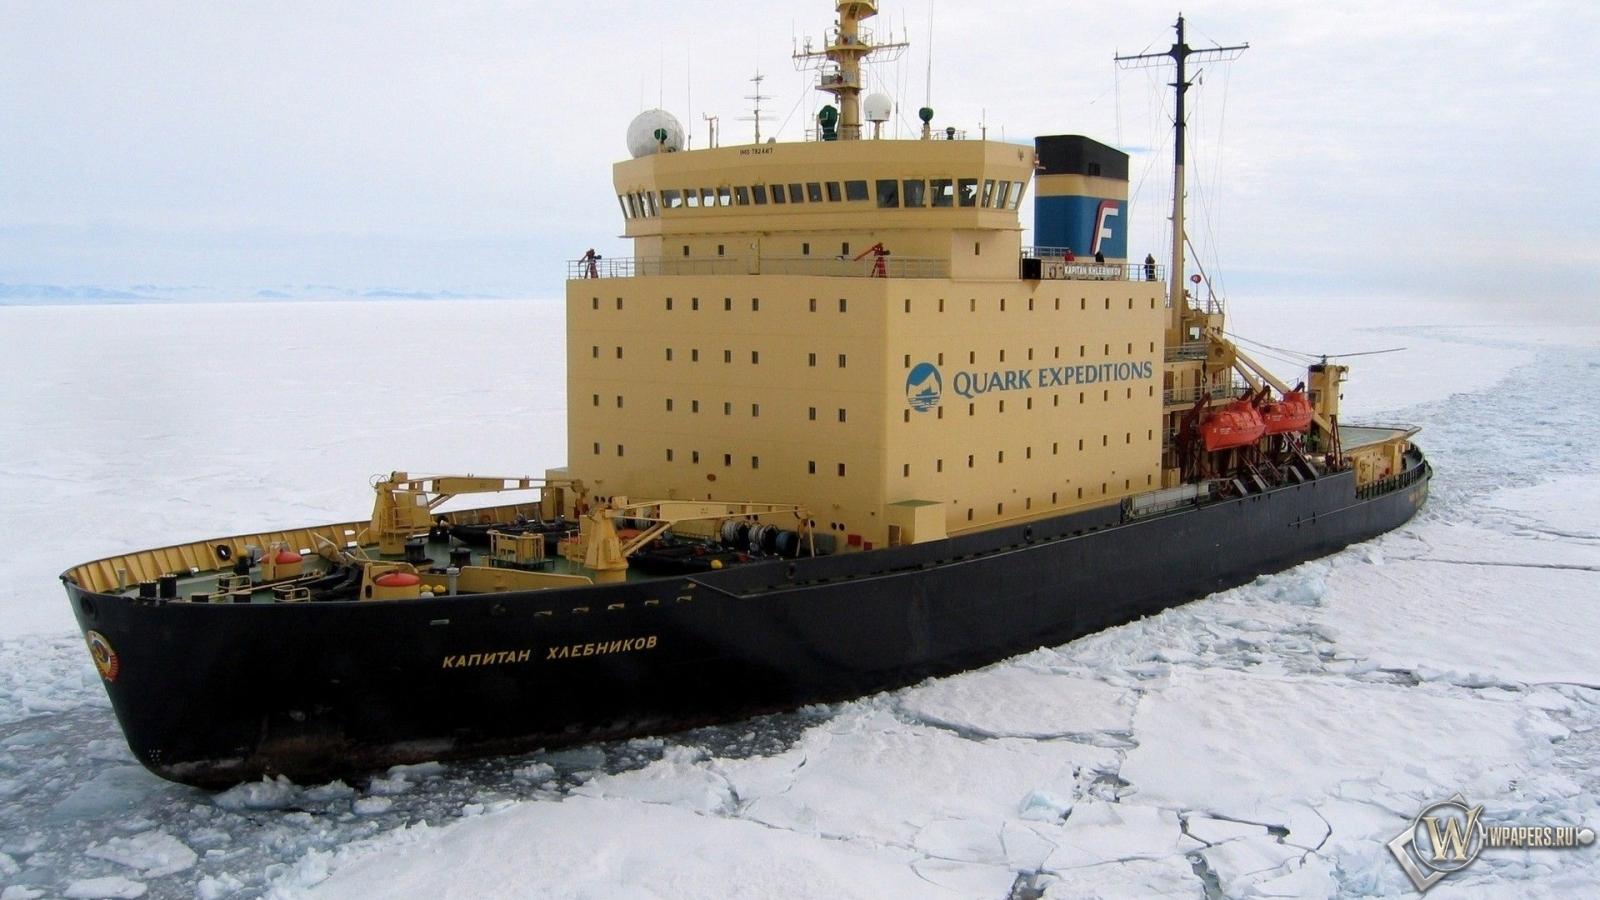 Ледокол капитан Хлебников 1600x900